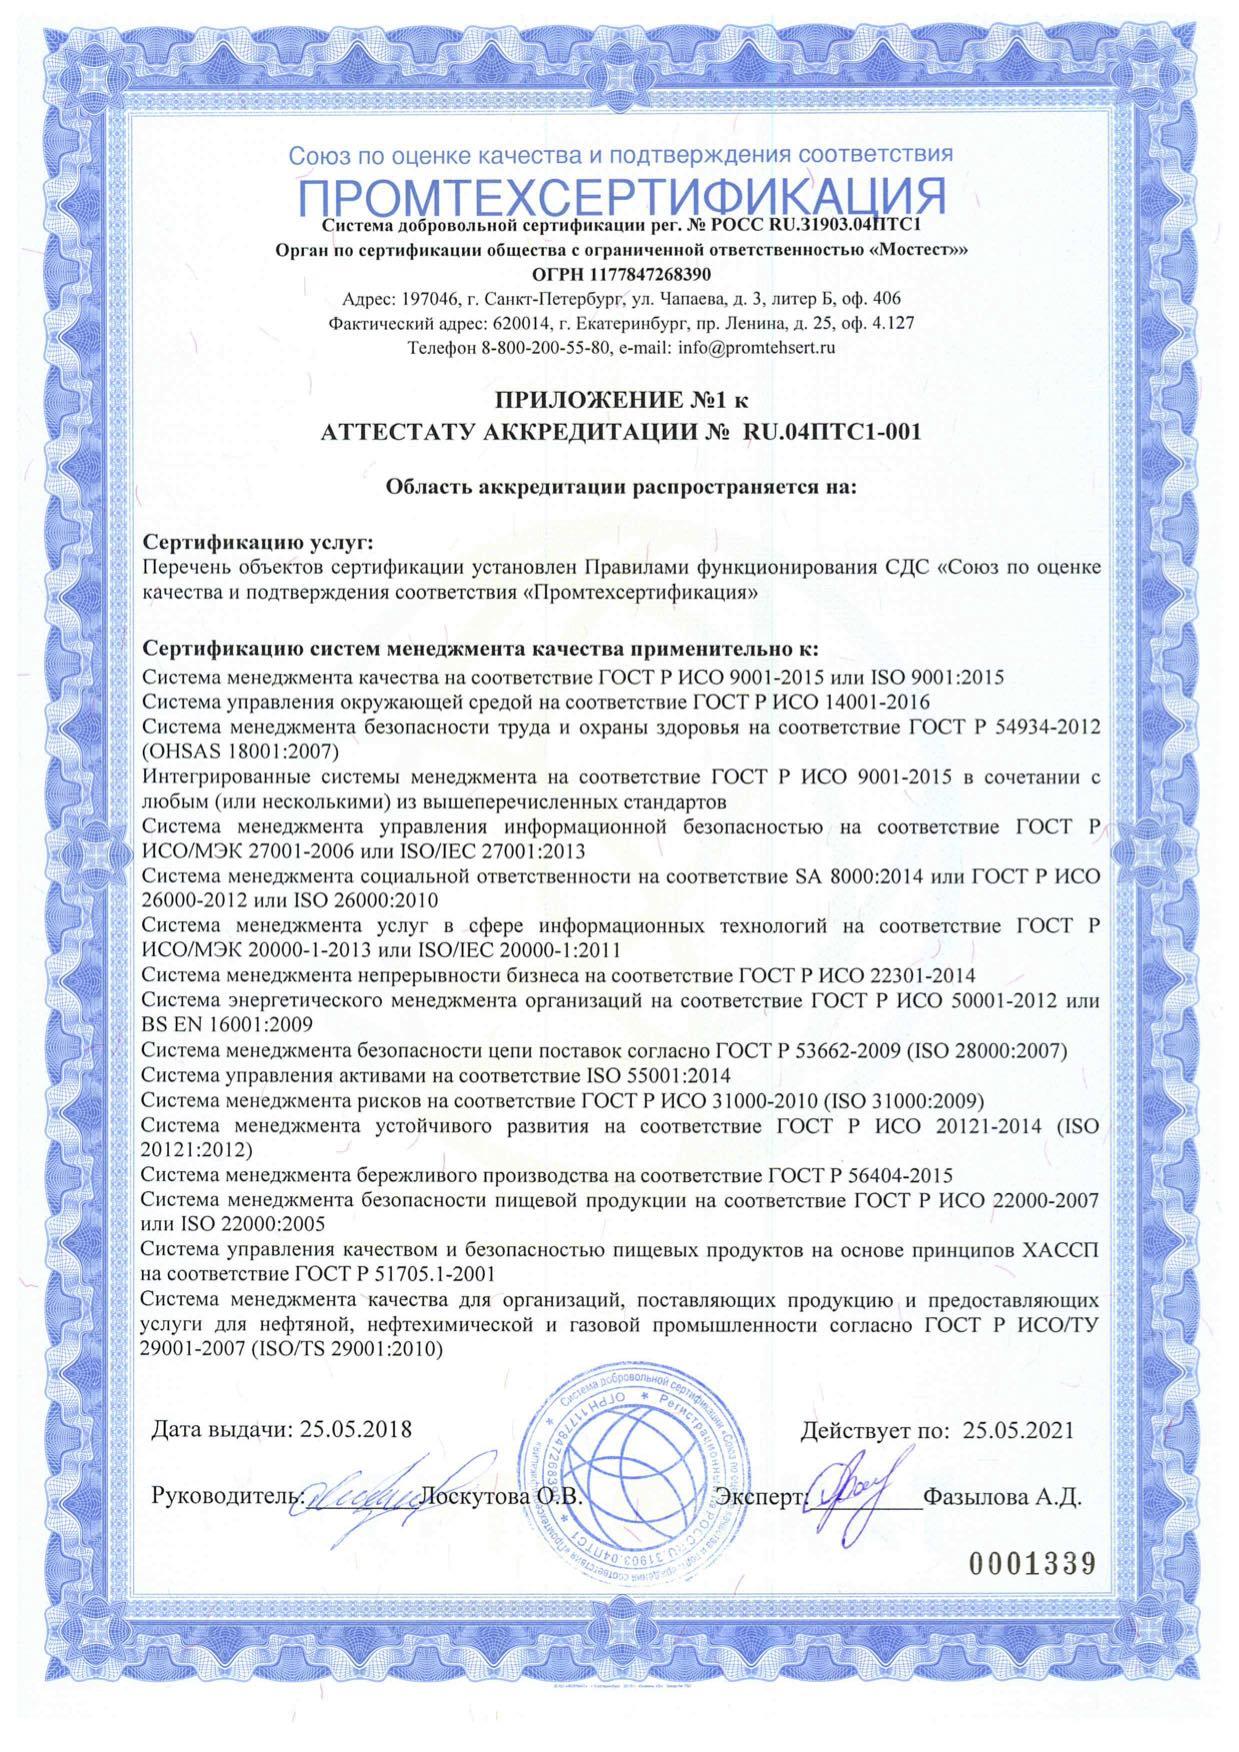 Аттестат аккредитации Мостест